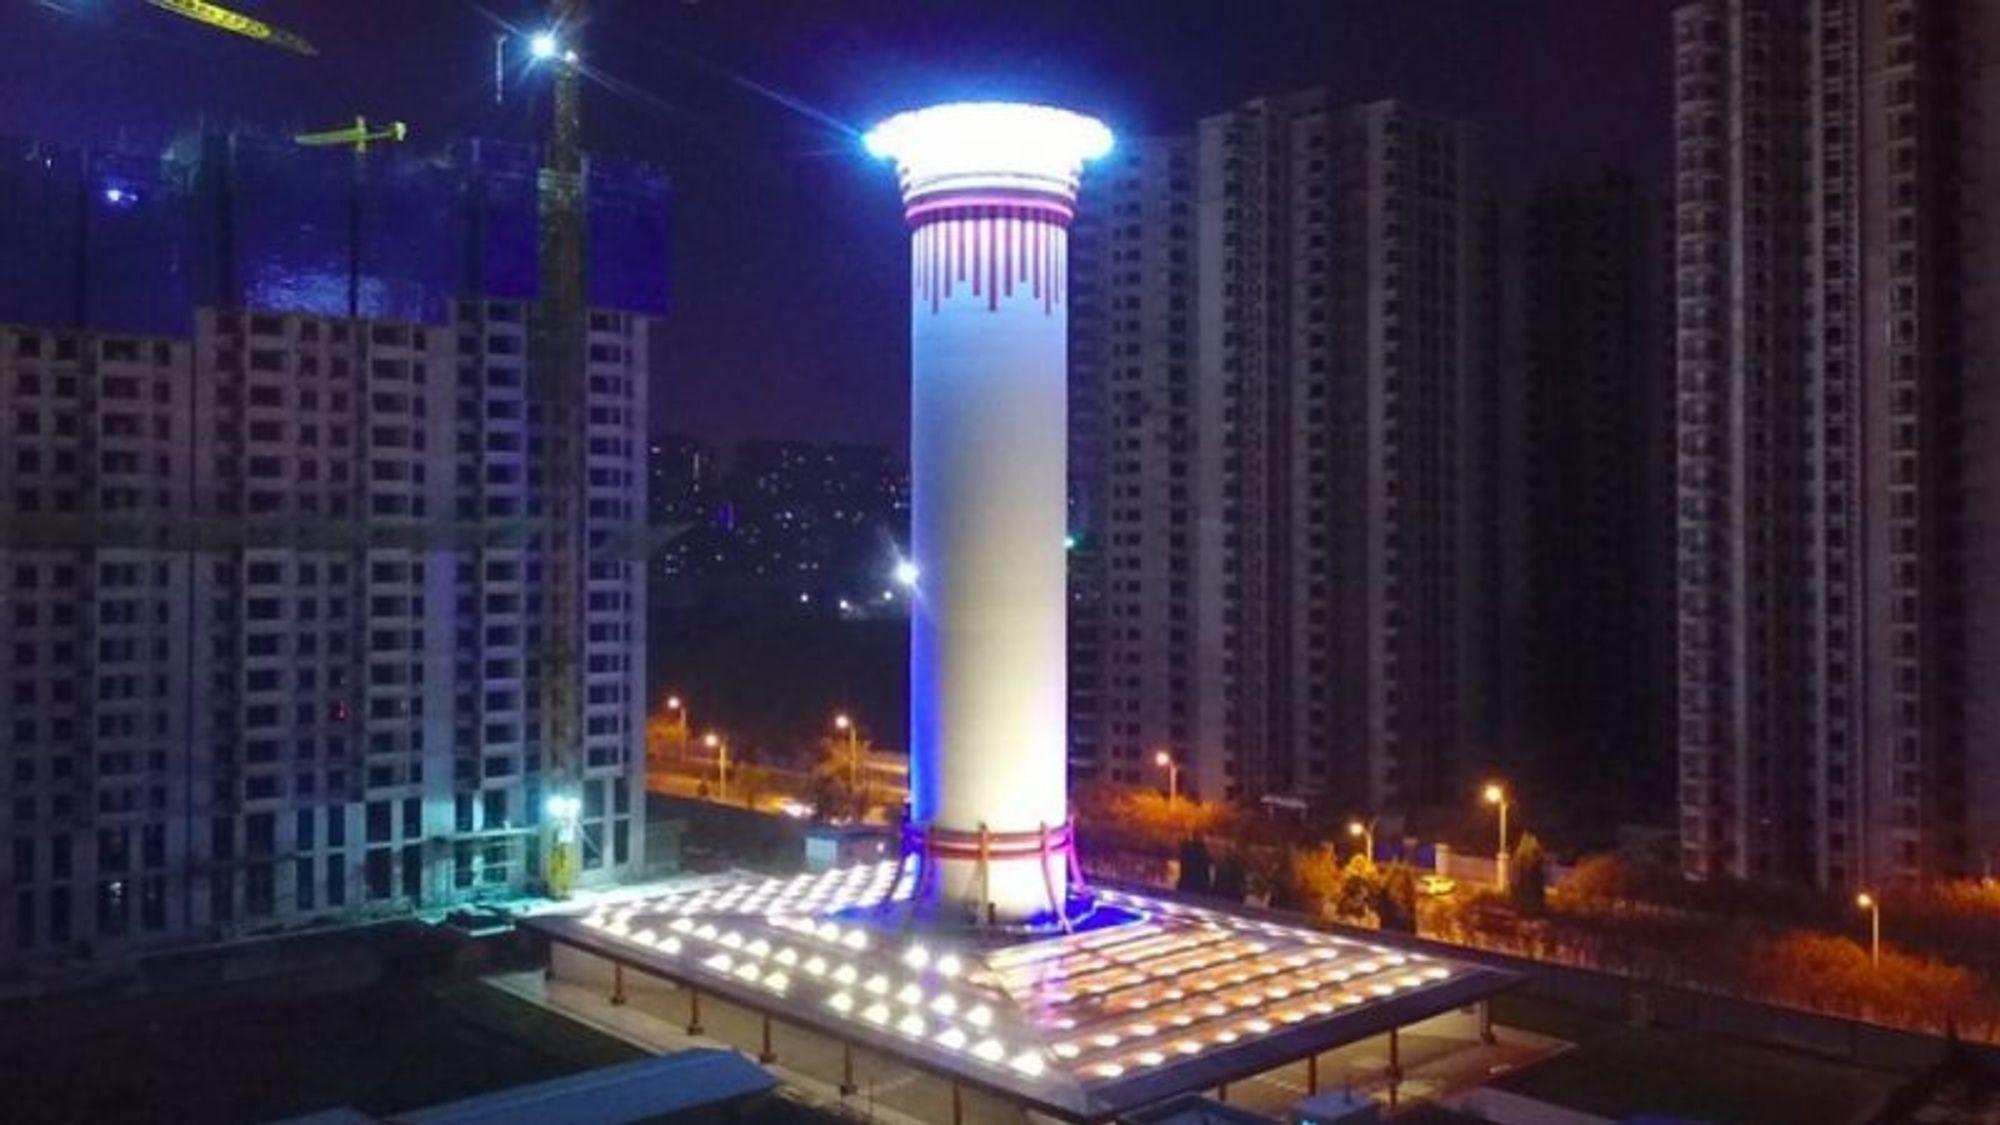 I den kinesiske byen Xian har Chinese Academy of Science bygget et 100 meter høyt tårn som filtrerer og renser luften. De første resultatene viser at den bidra til bedre luftkvalitet i et område på 10 kvadratkilometer.